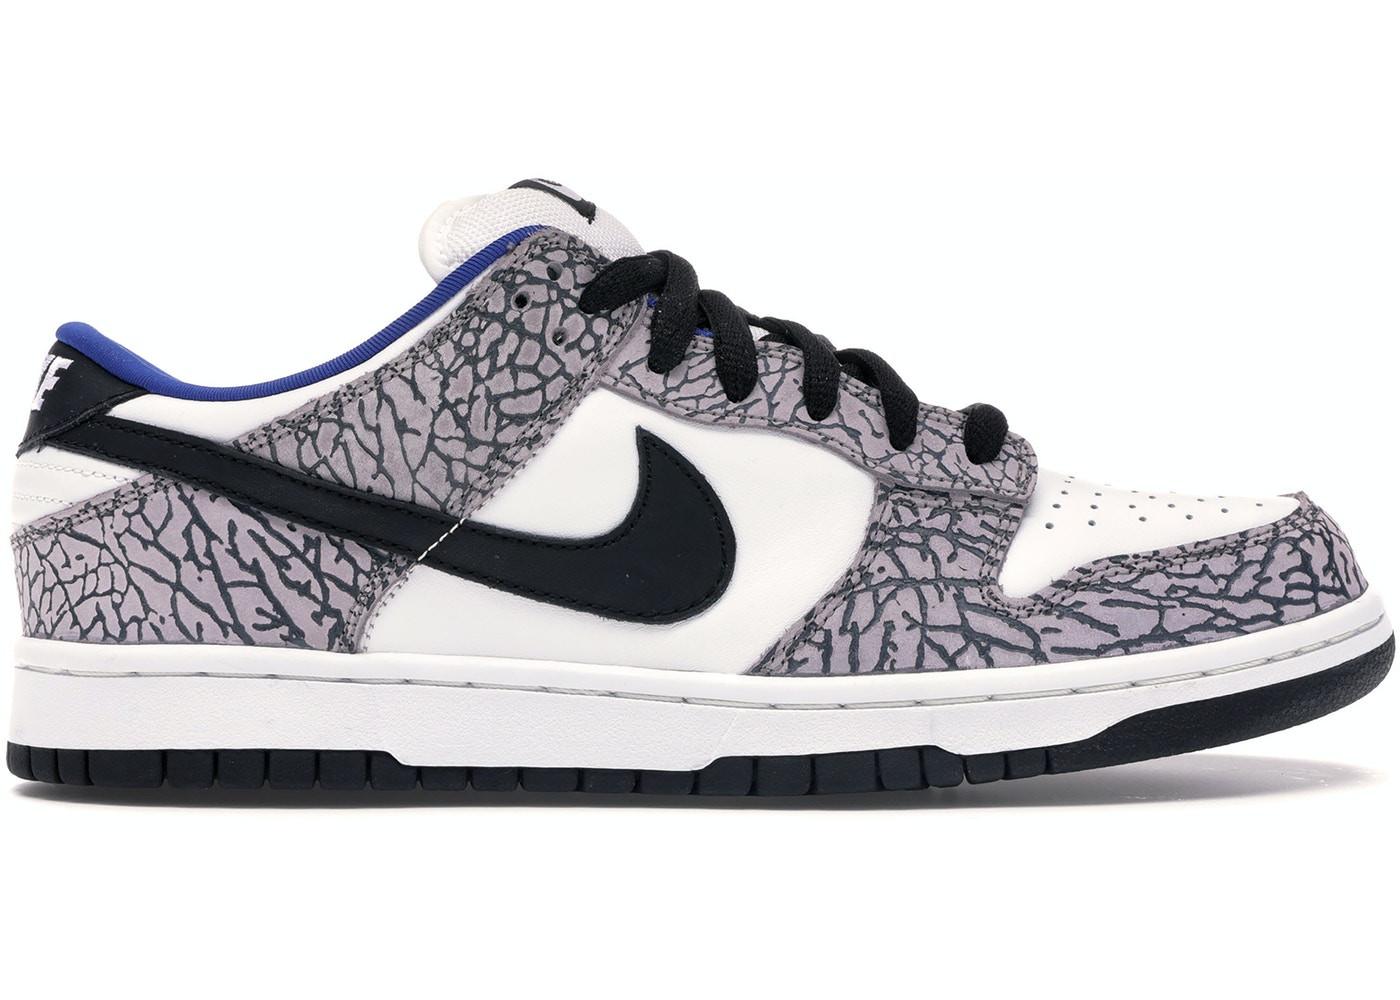 Nike Dunk SB Low Supreme